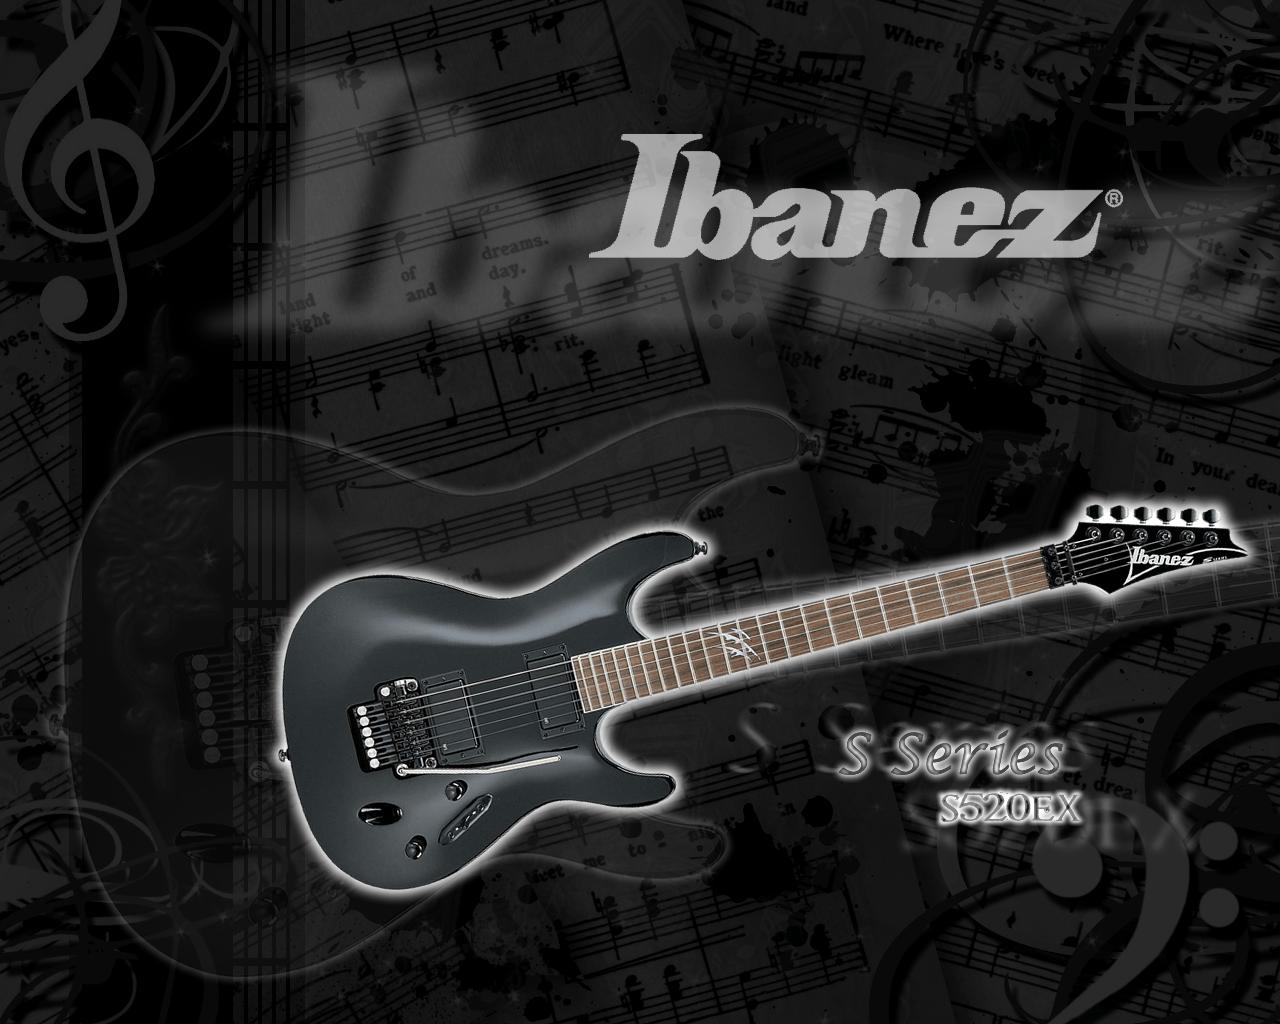 ibanez bass guitar wallpaperon - photo #15